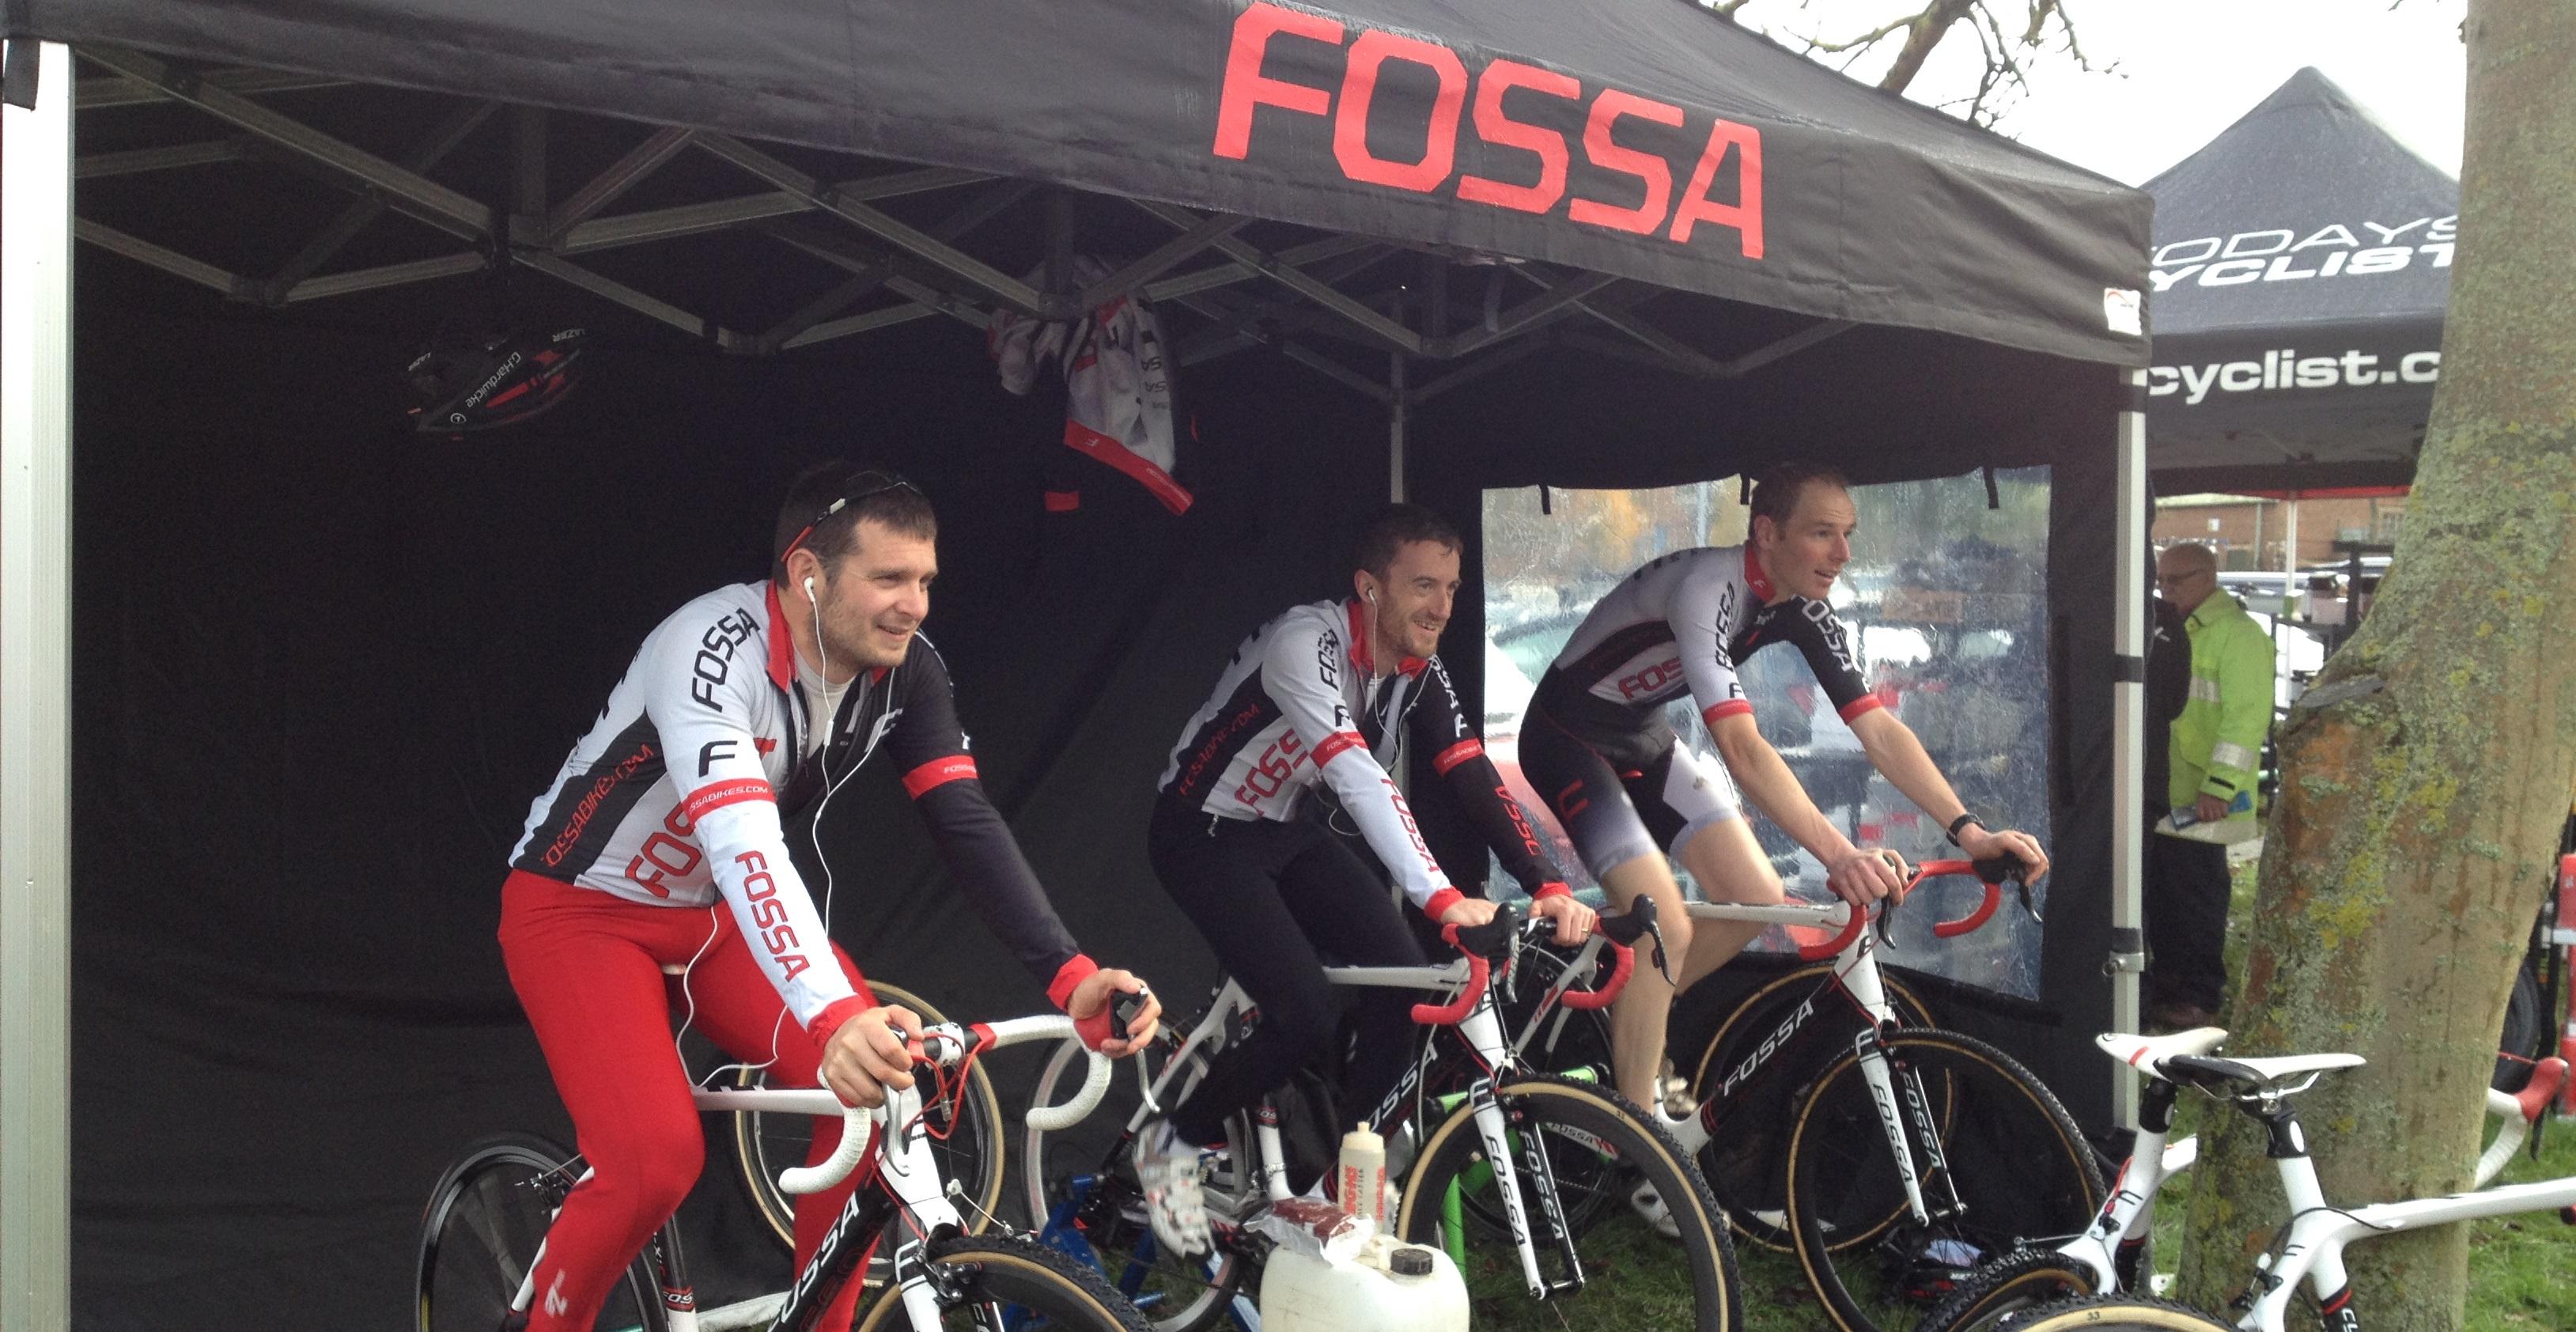 Fossa Racing